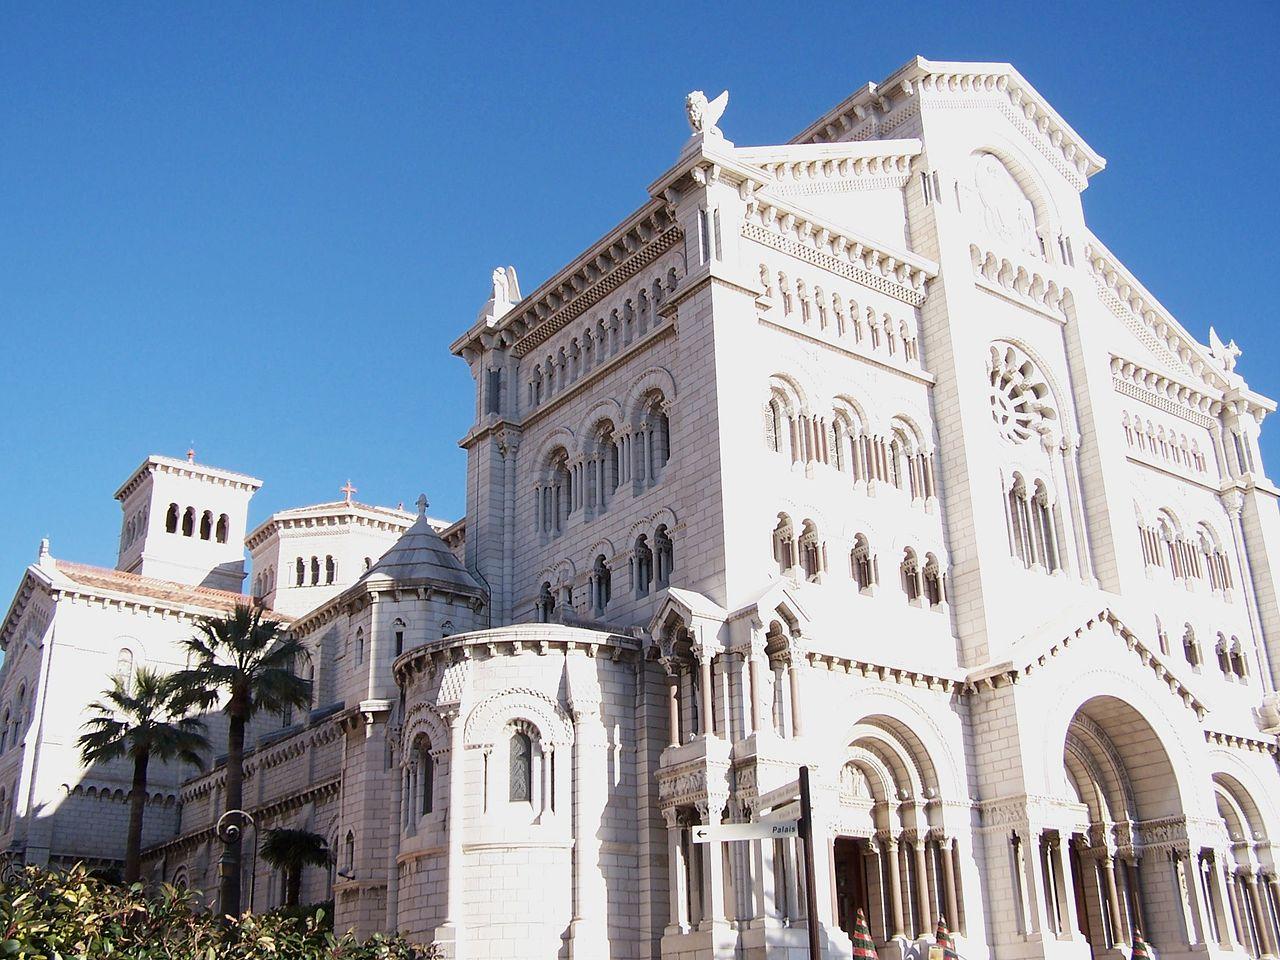 Principauté de Monaco, cathédrale de l'Immaculée © wikimedia commons / DarioSpagnolo